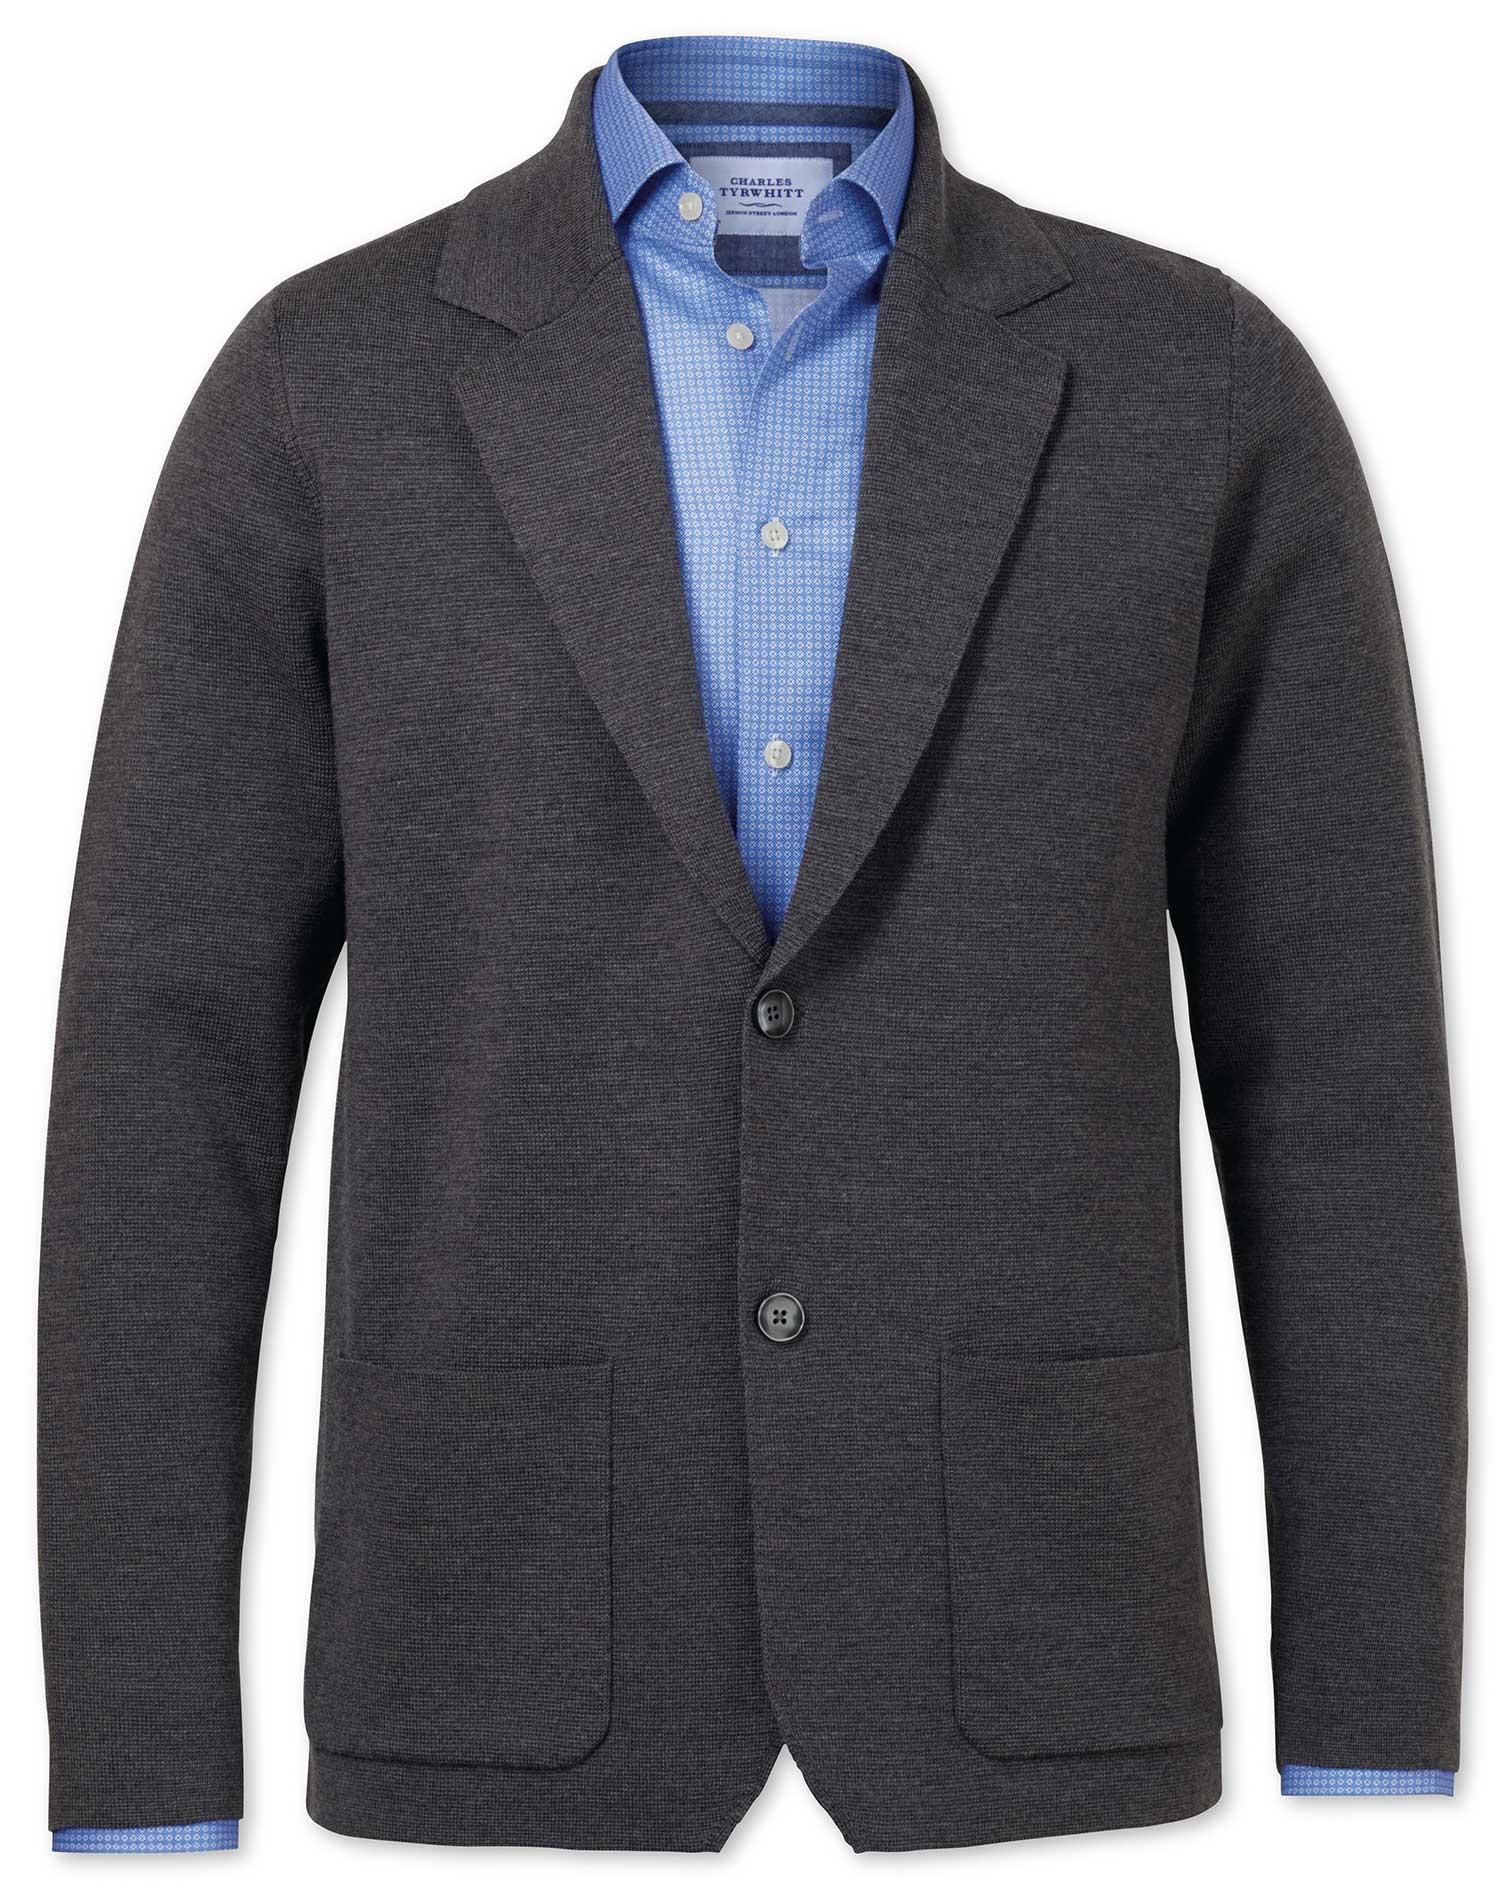 Charcoal Merino Wool Blazer Size XS by Charles Tyrwhitt